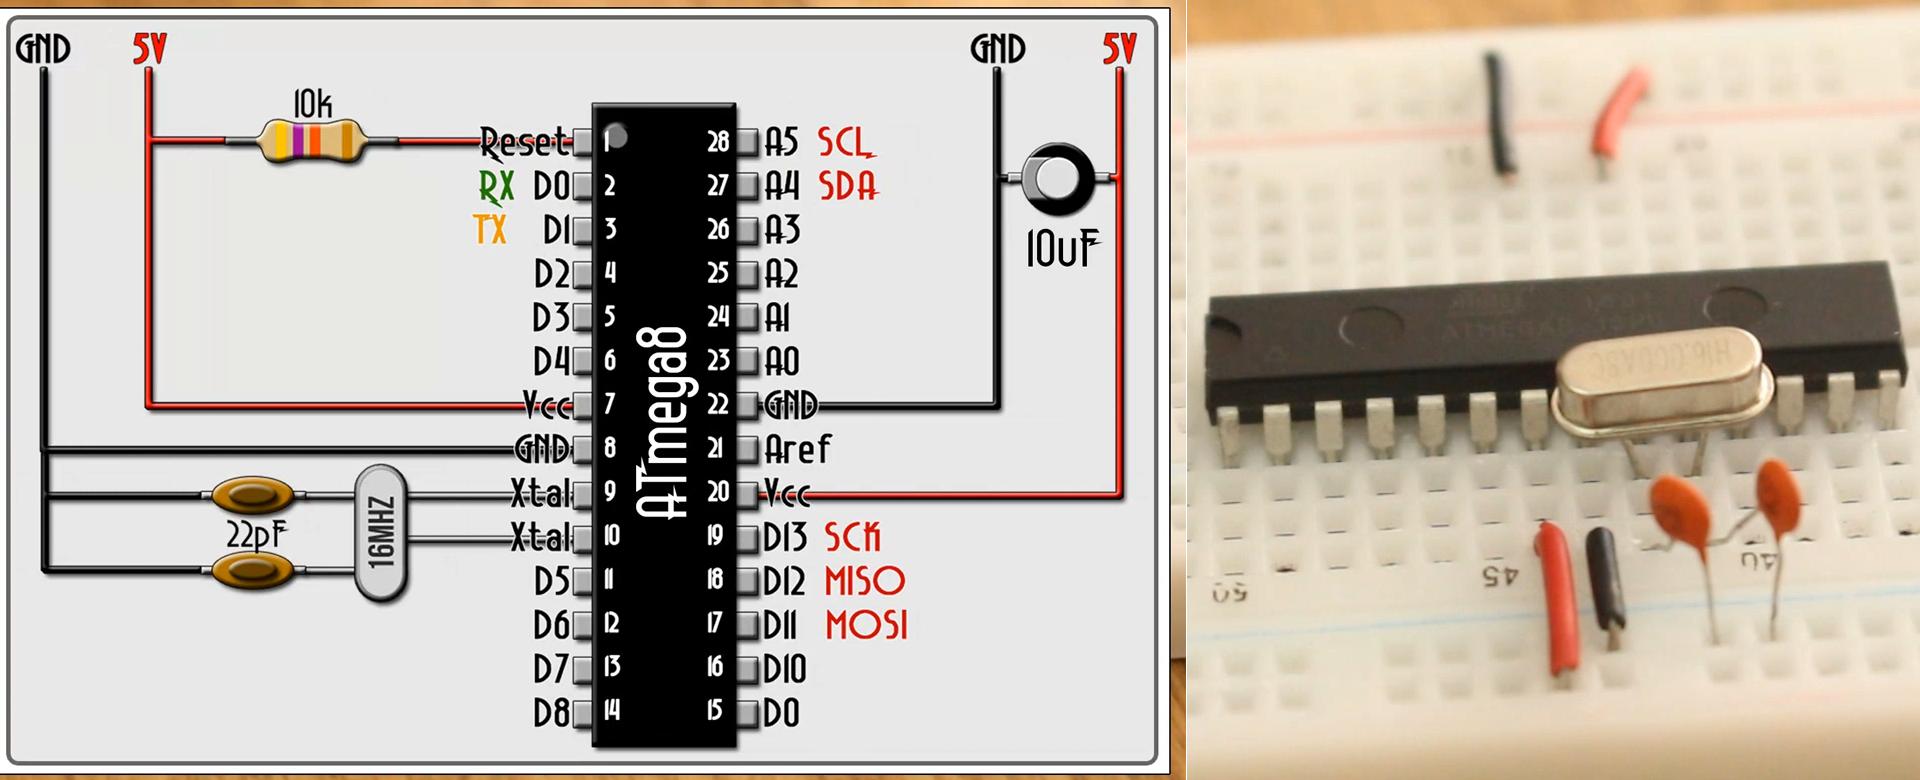 16MHz bootloader for Atmega8 arduino IDE